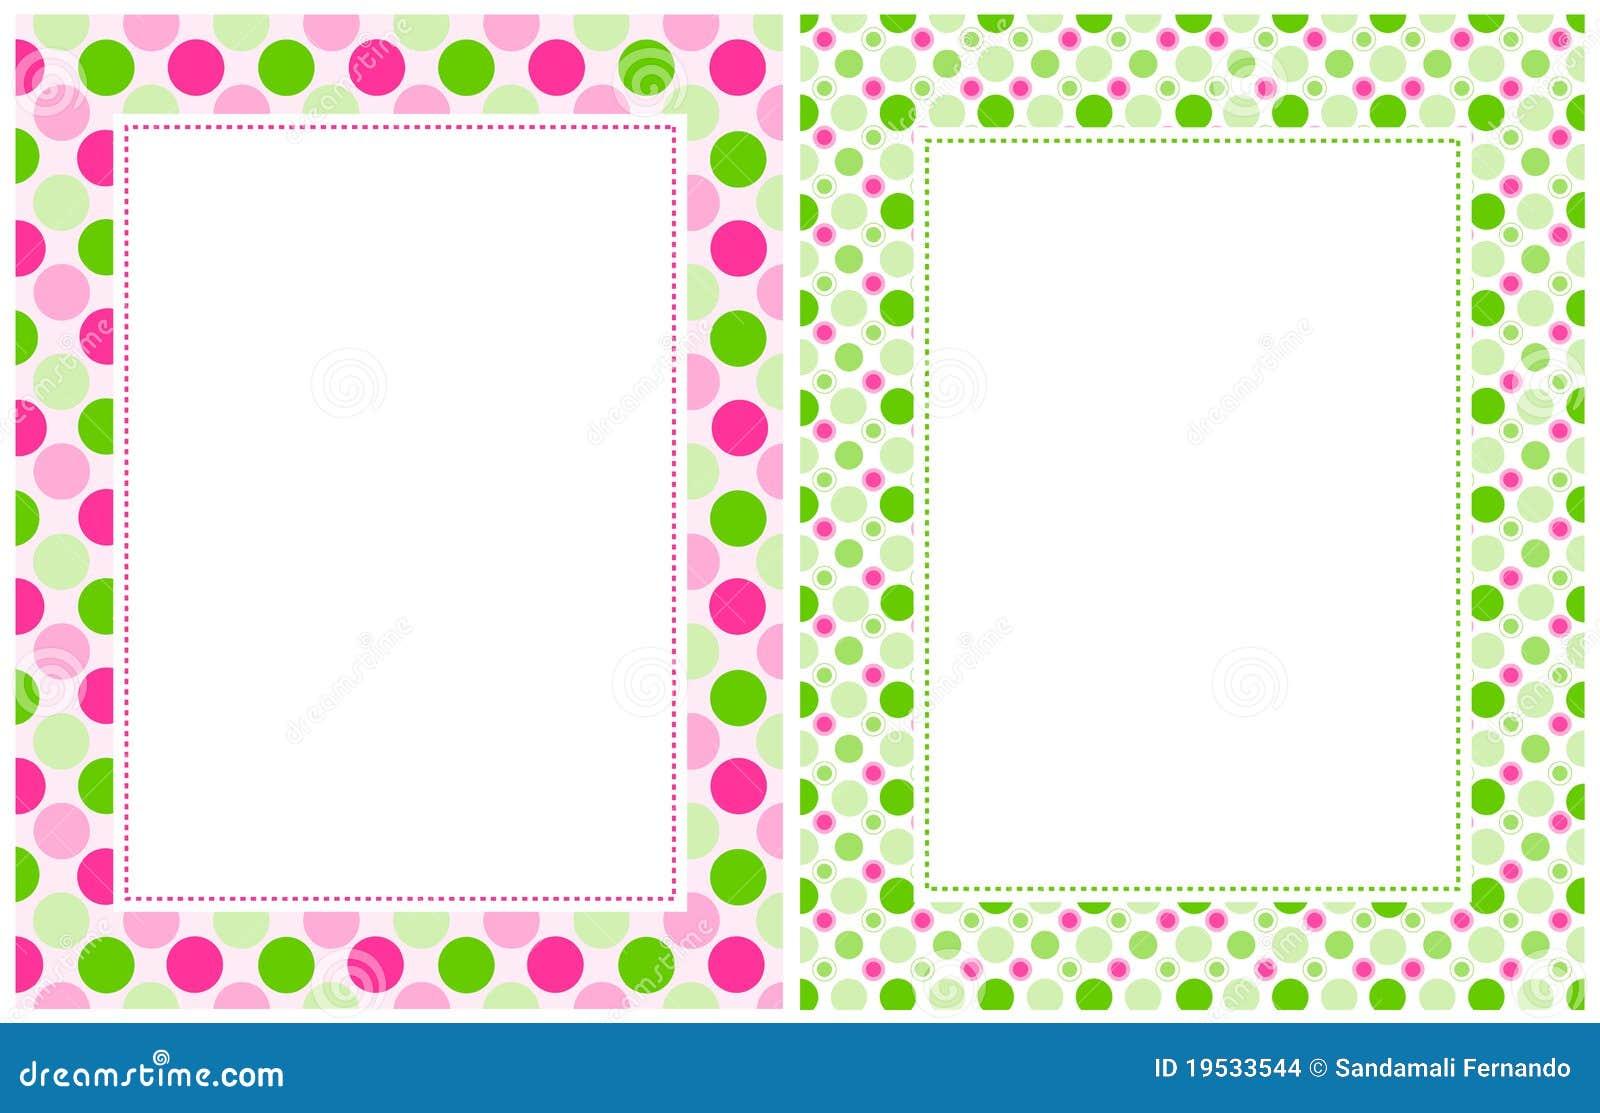 Retro Polka Dots Border Stock Images - Image: 19533544